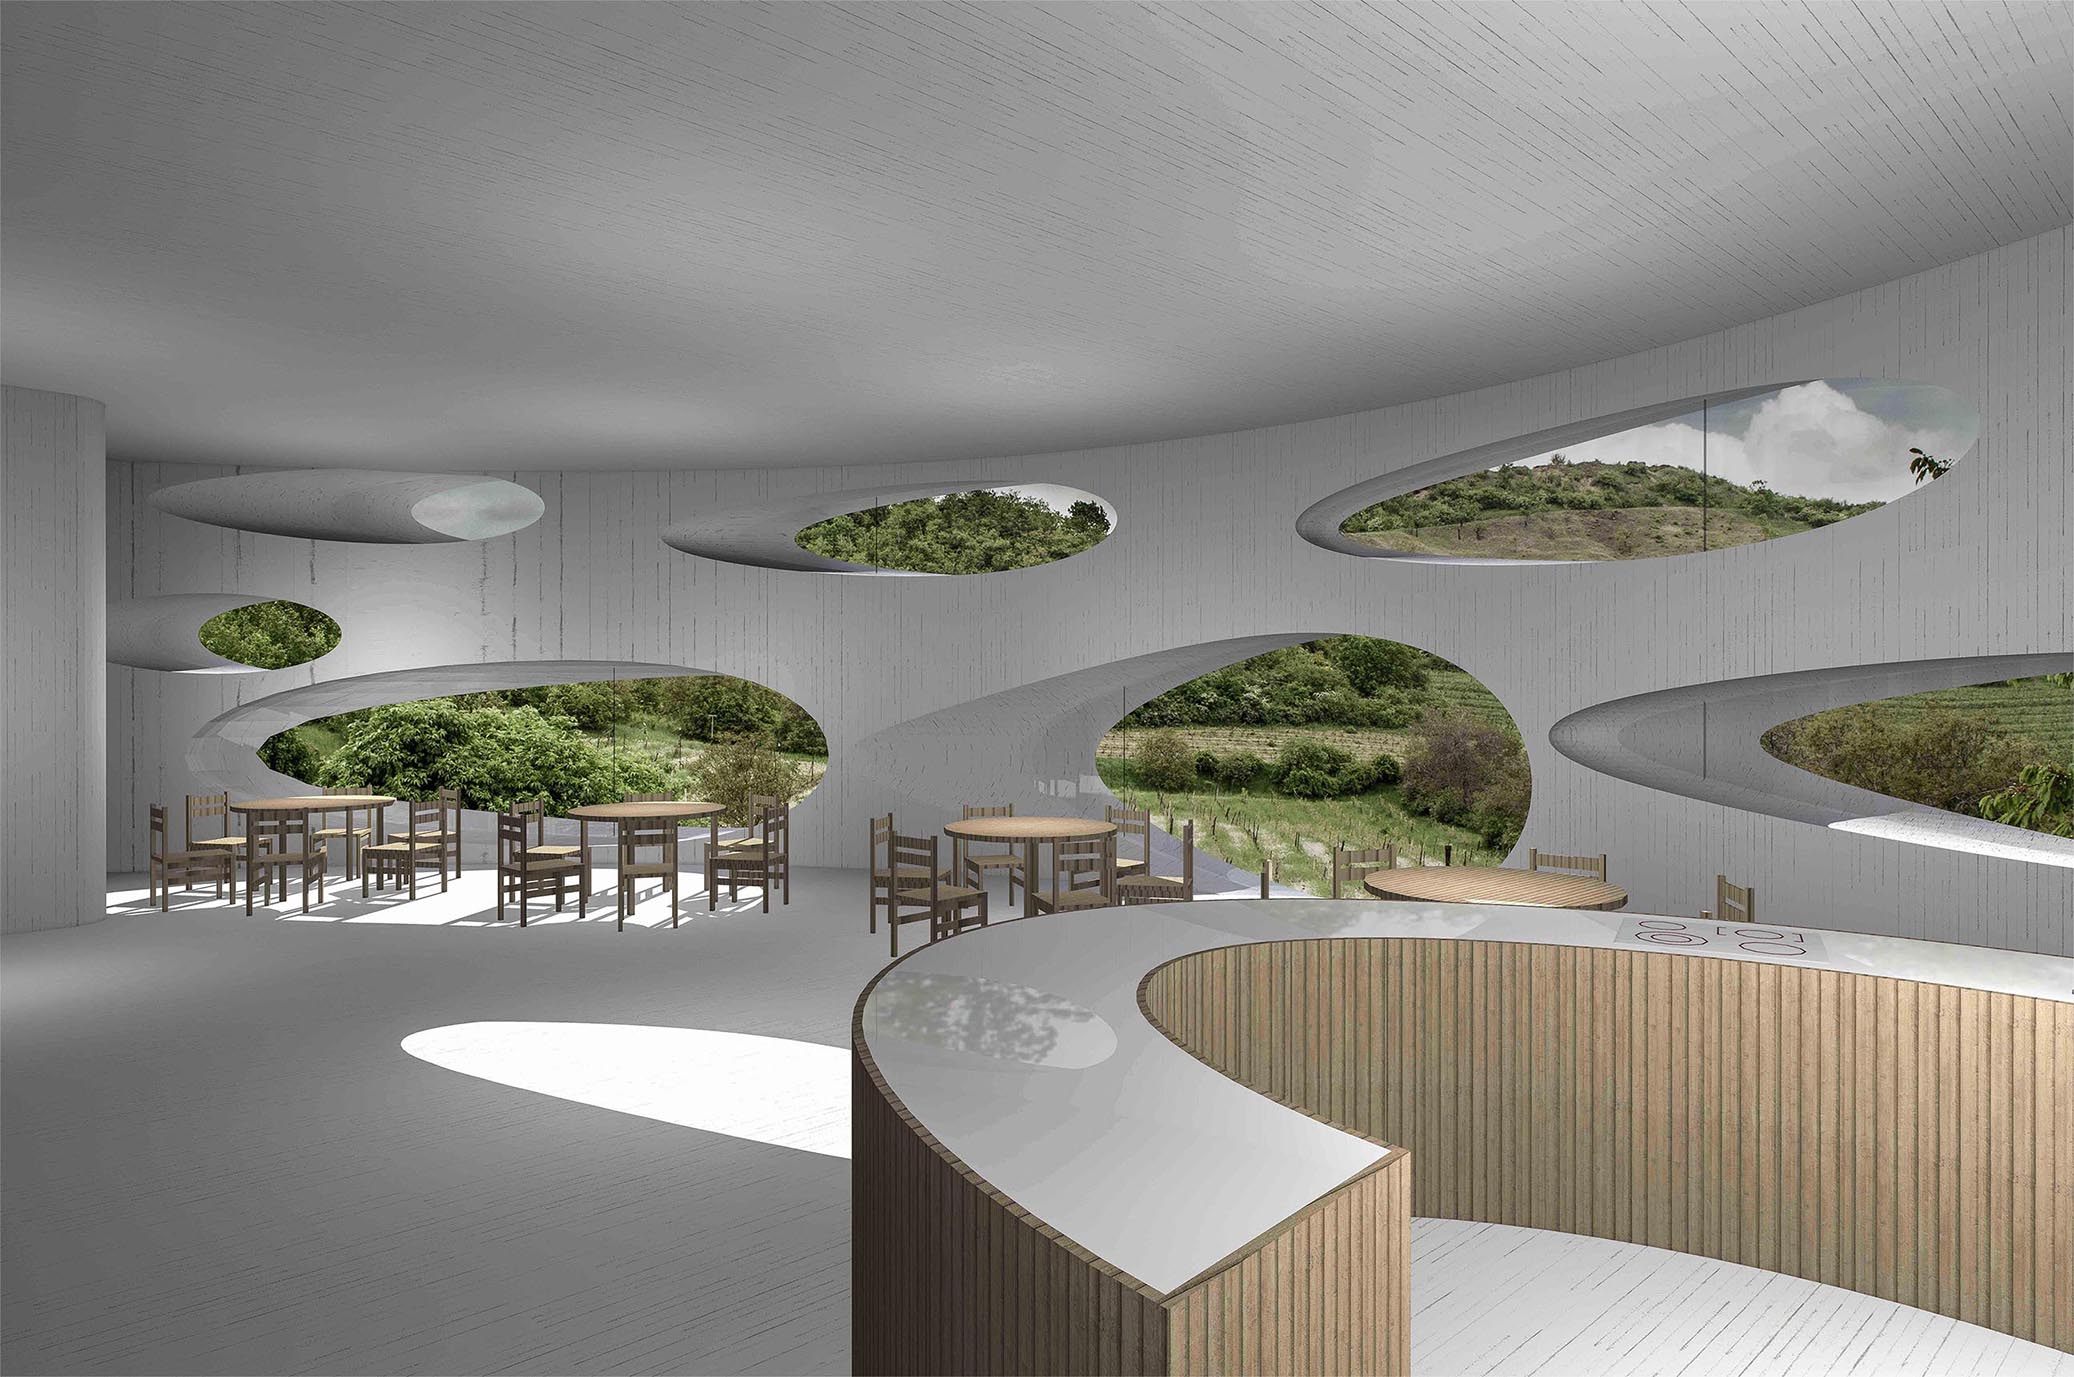 Vinařství Pod Chlumem - vizualice interiéru. Autor: KURZ architekti